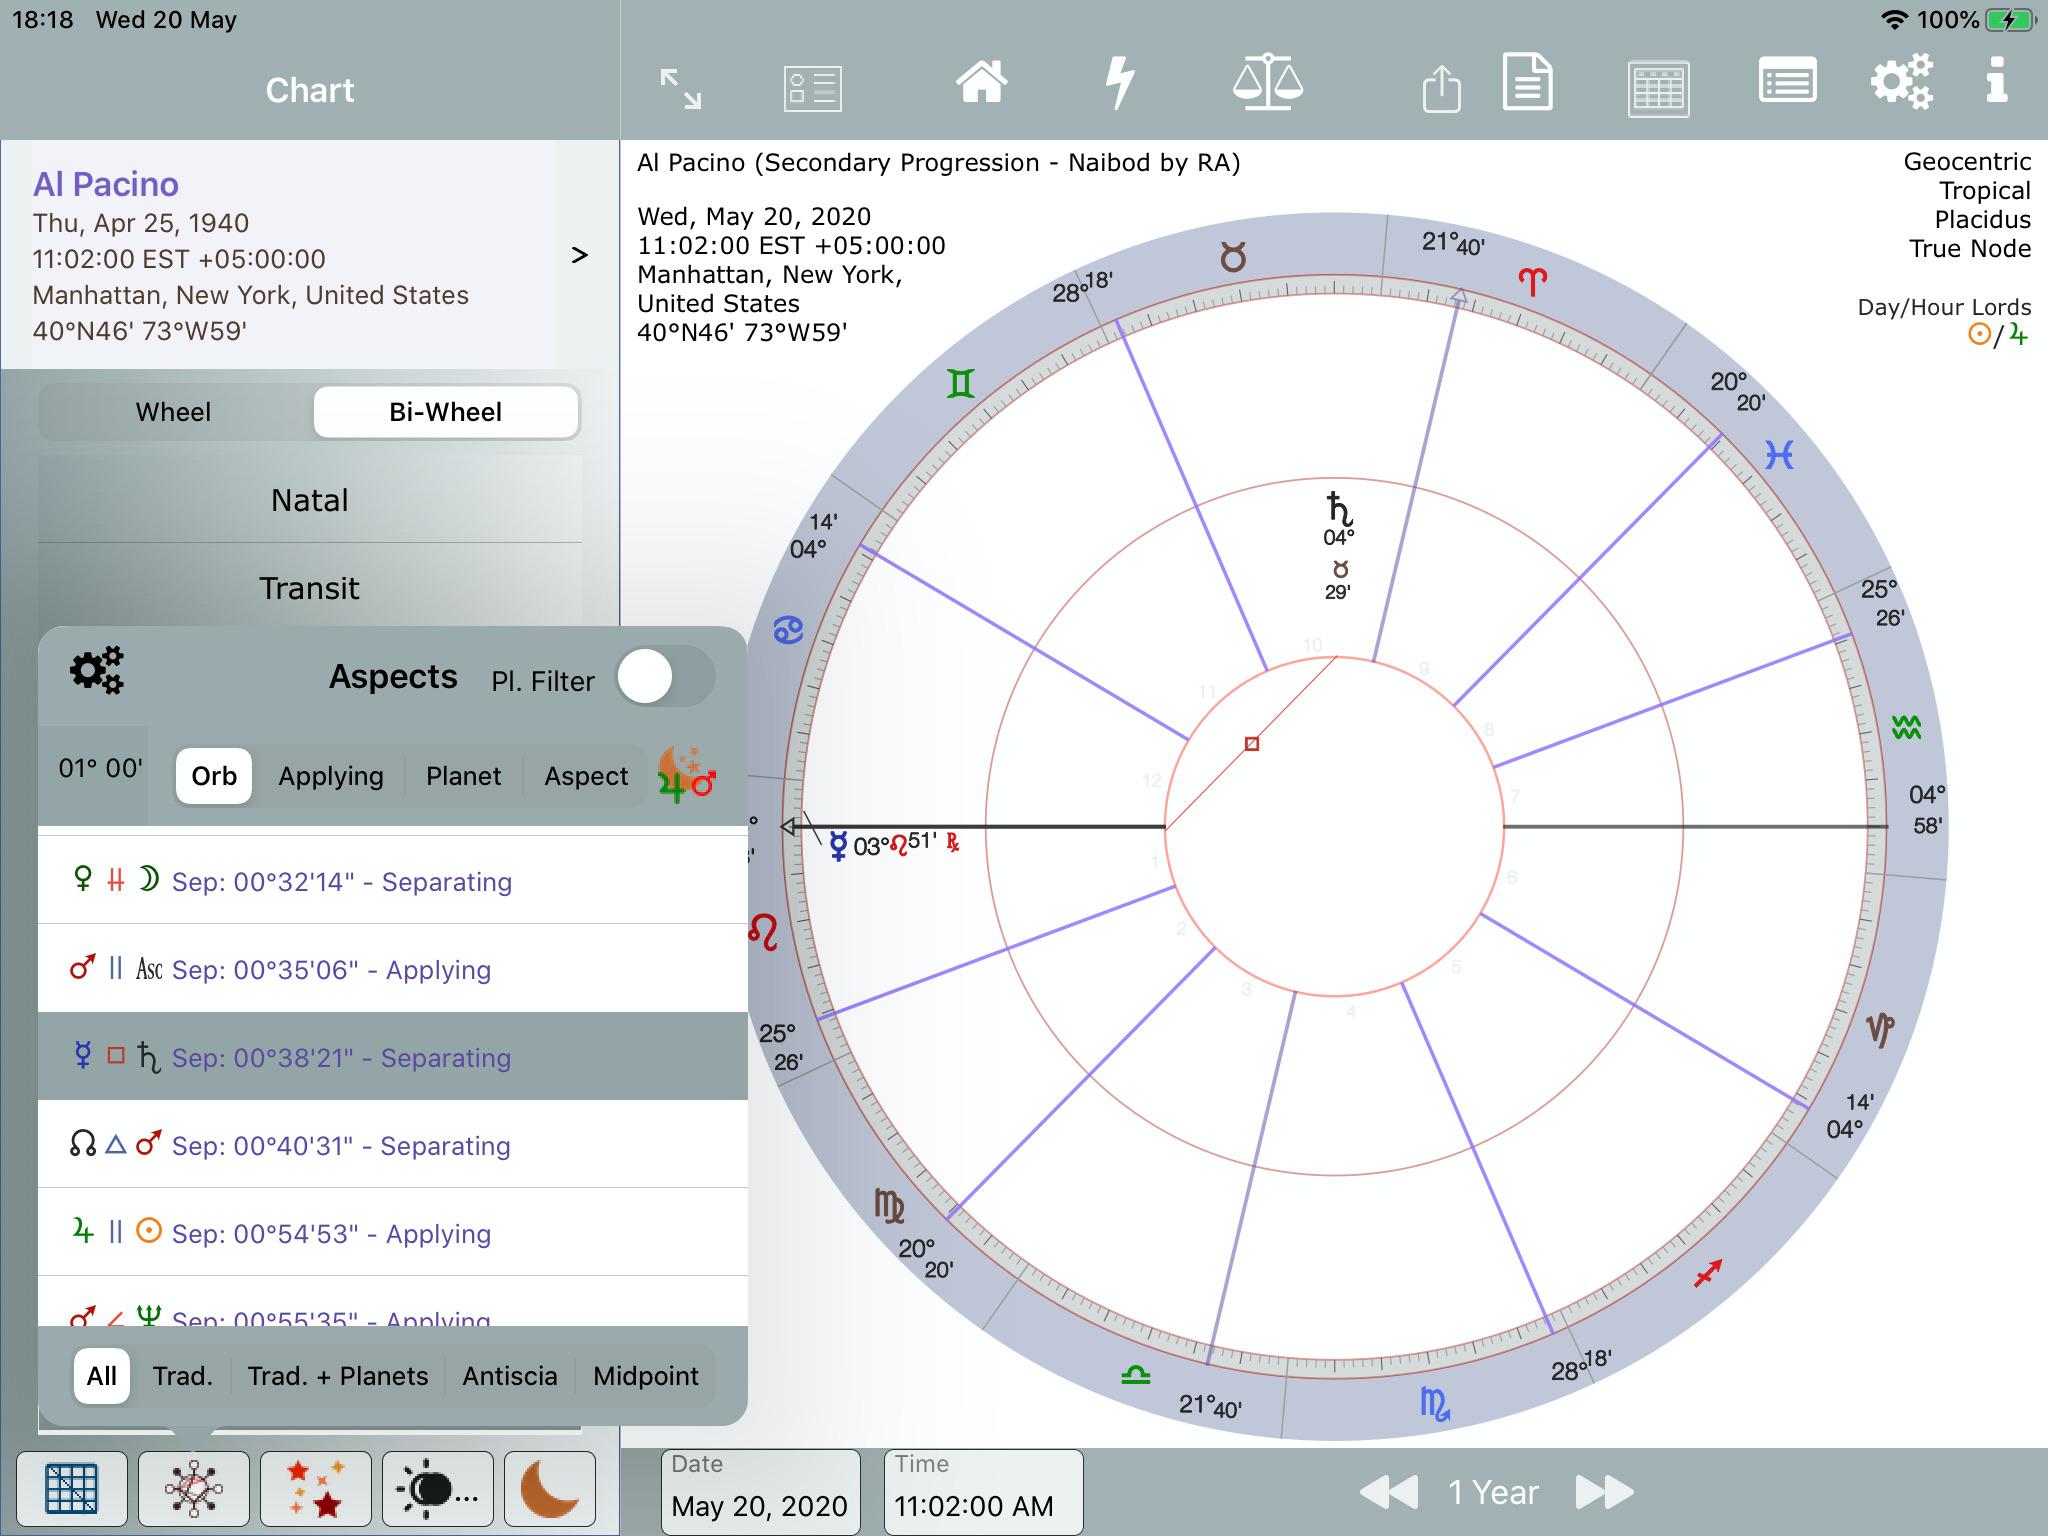 Al Pacino BI-Wheel isolated aspect